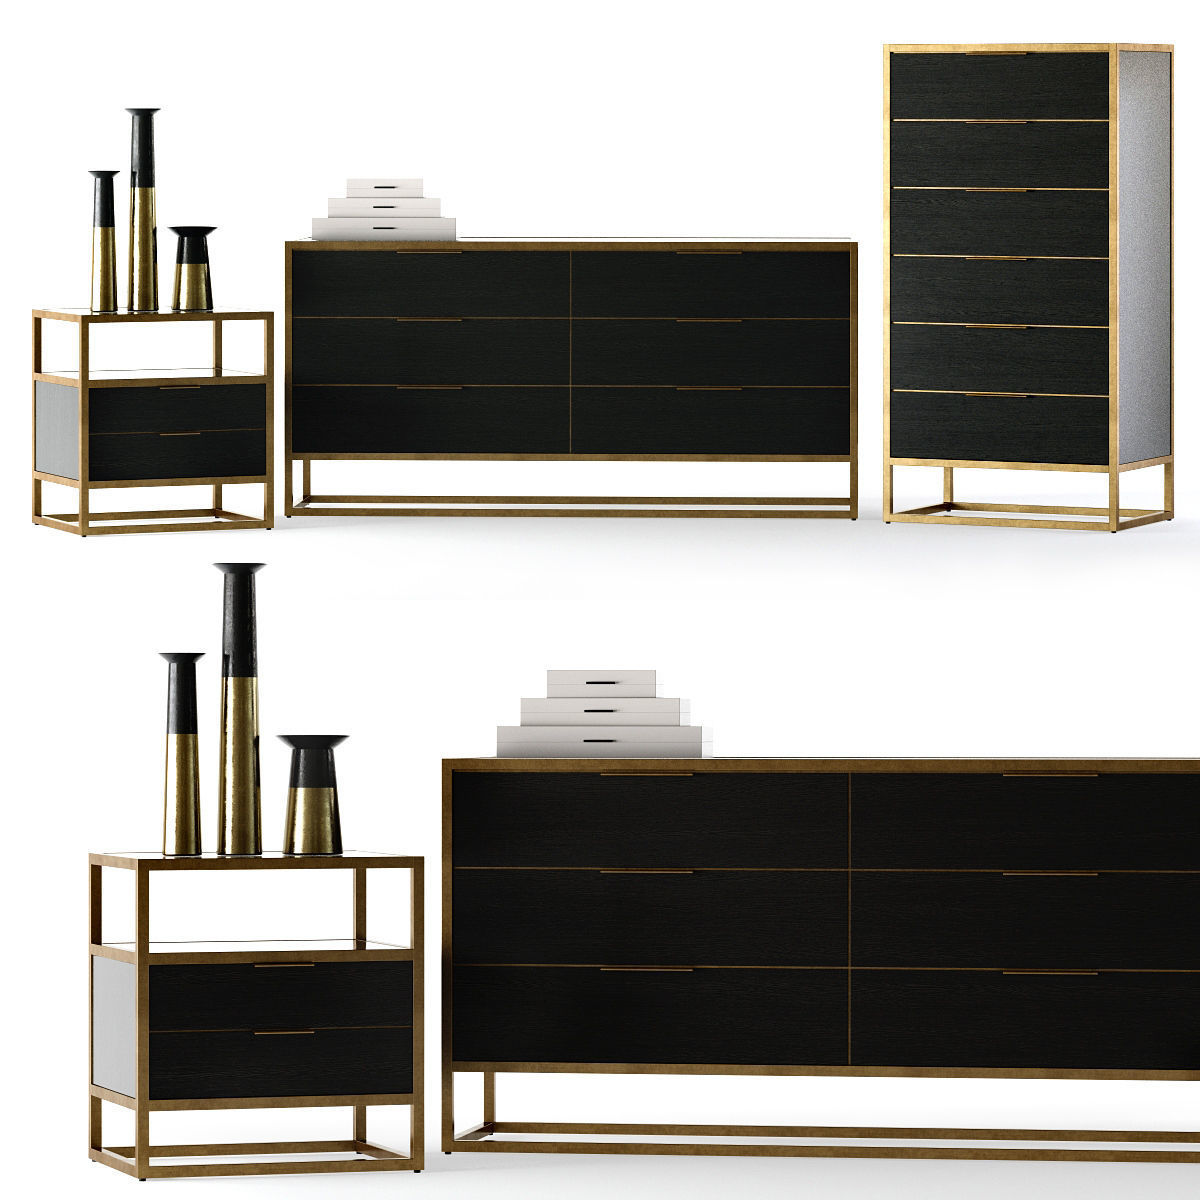 3d Model Crate And Barrel Oxford Bedroom Set Cgtrader